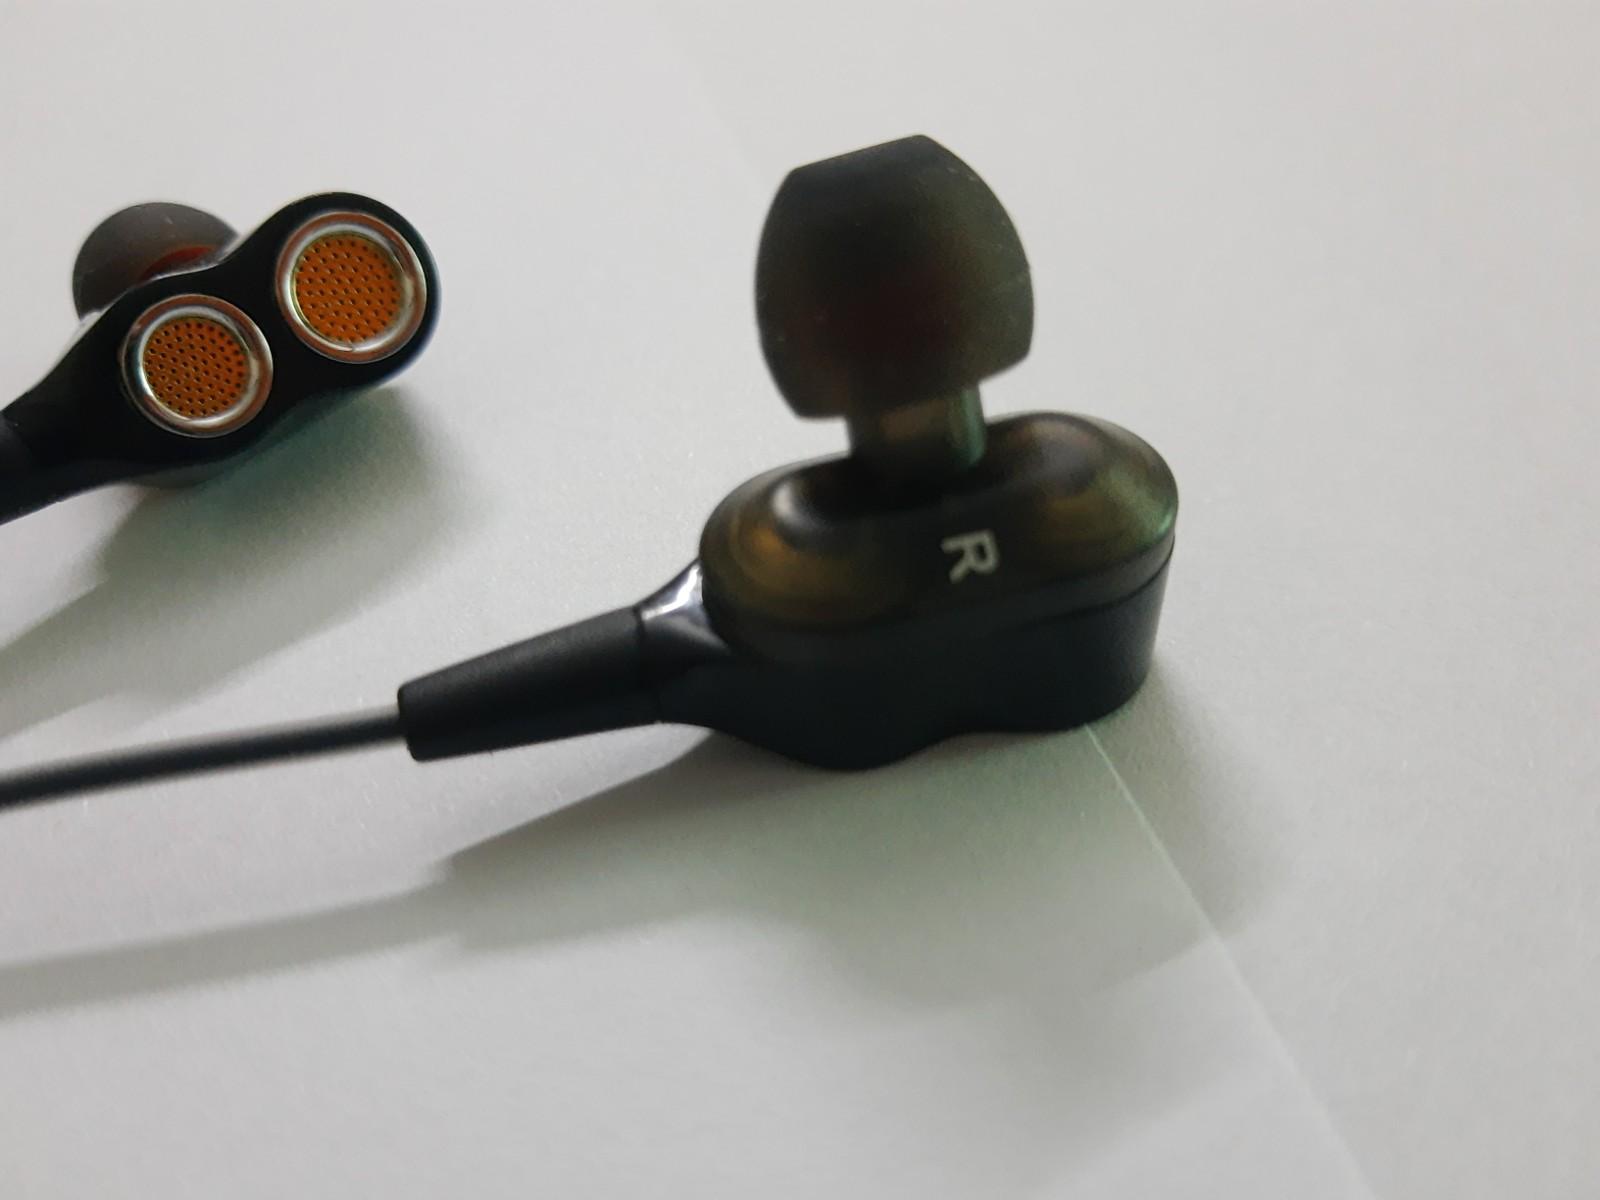 HKT Dual Speaker Bass earphones, handsfree with moving coil technology 3.5mm White_2